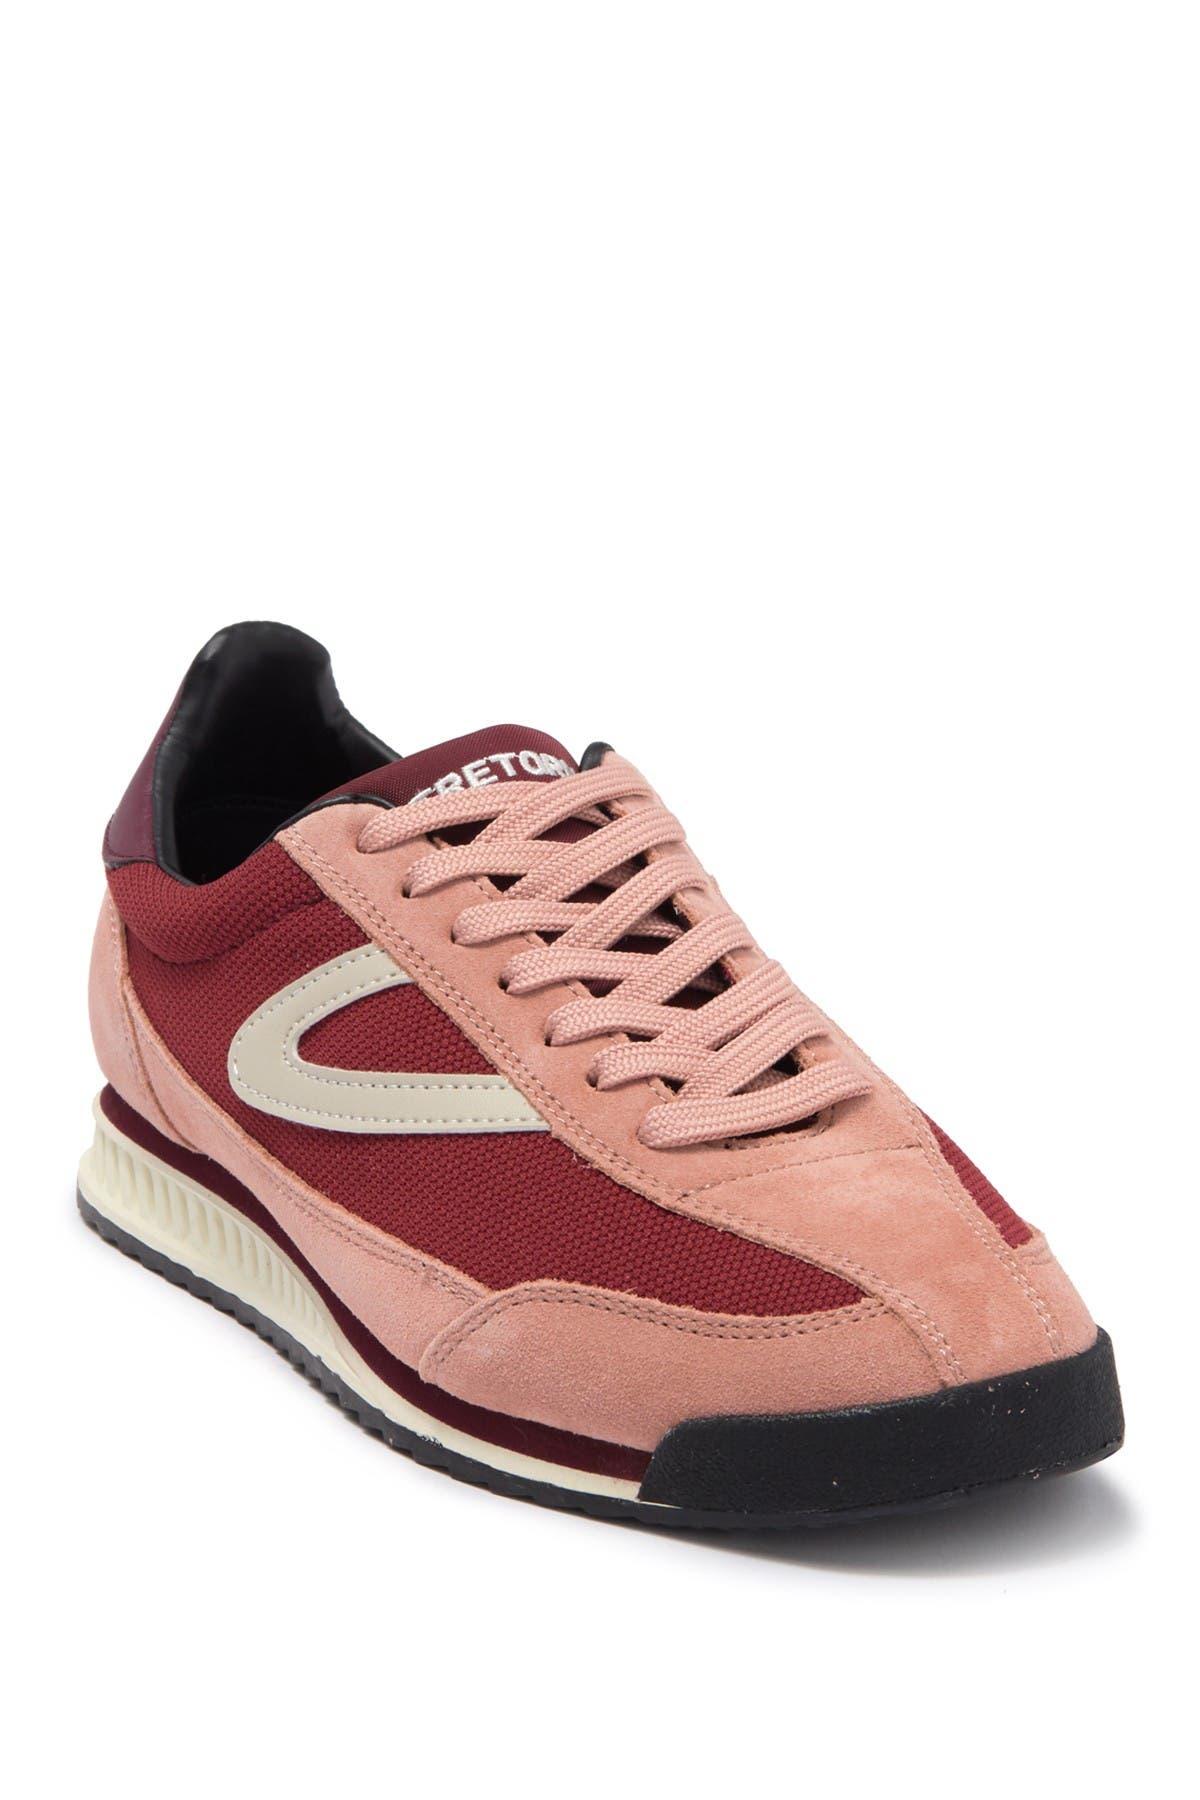 Image of Tretorn Rawlins 8 Sneaker